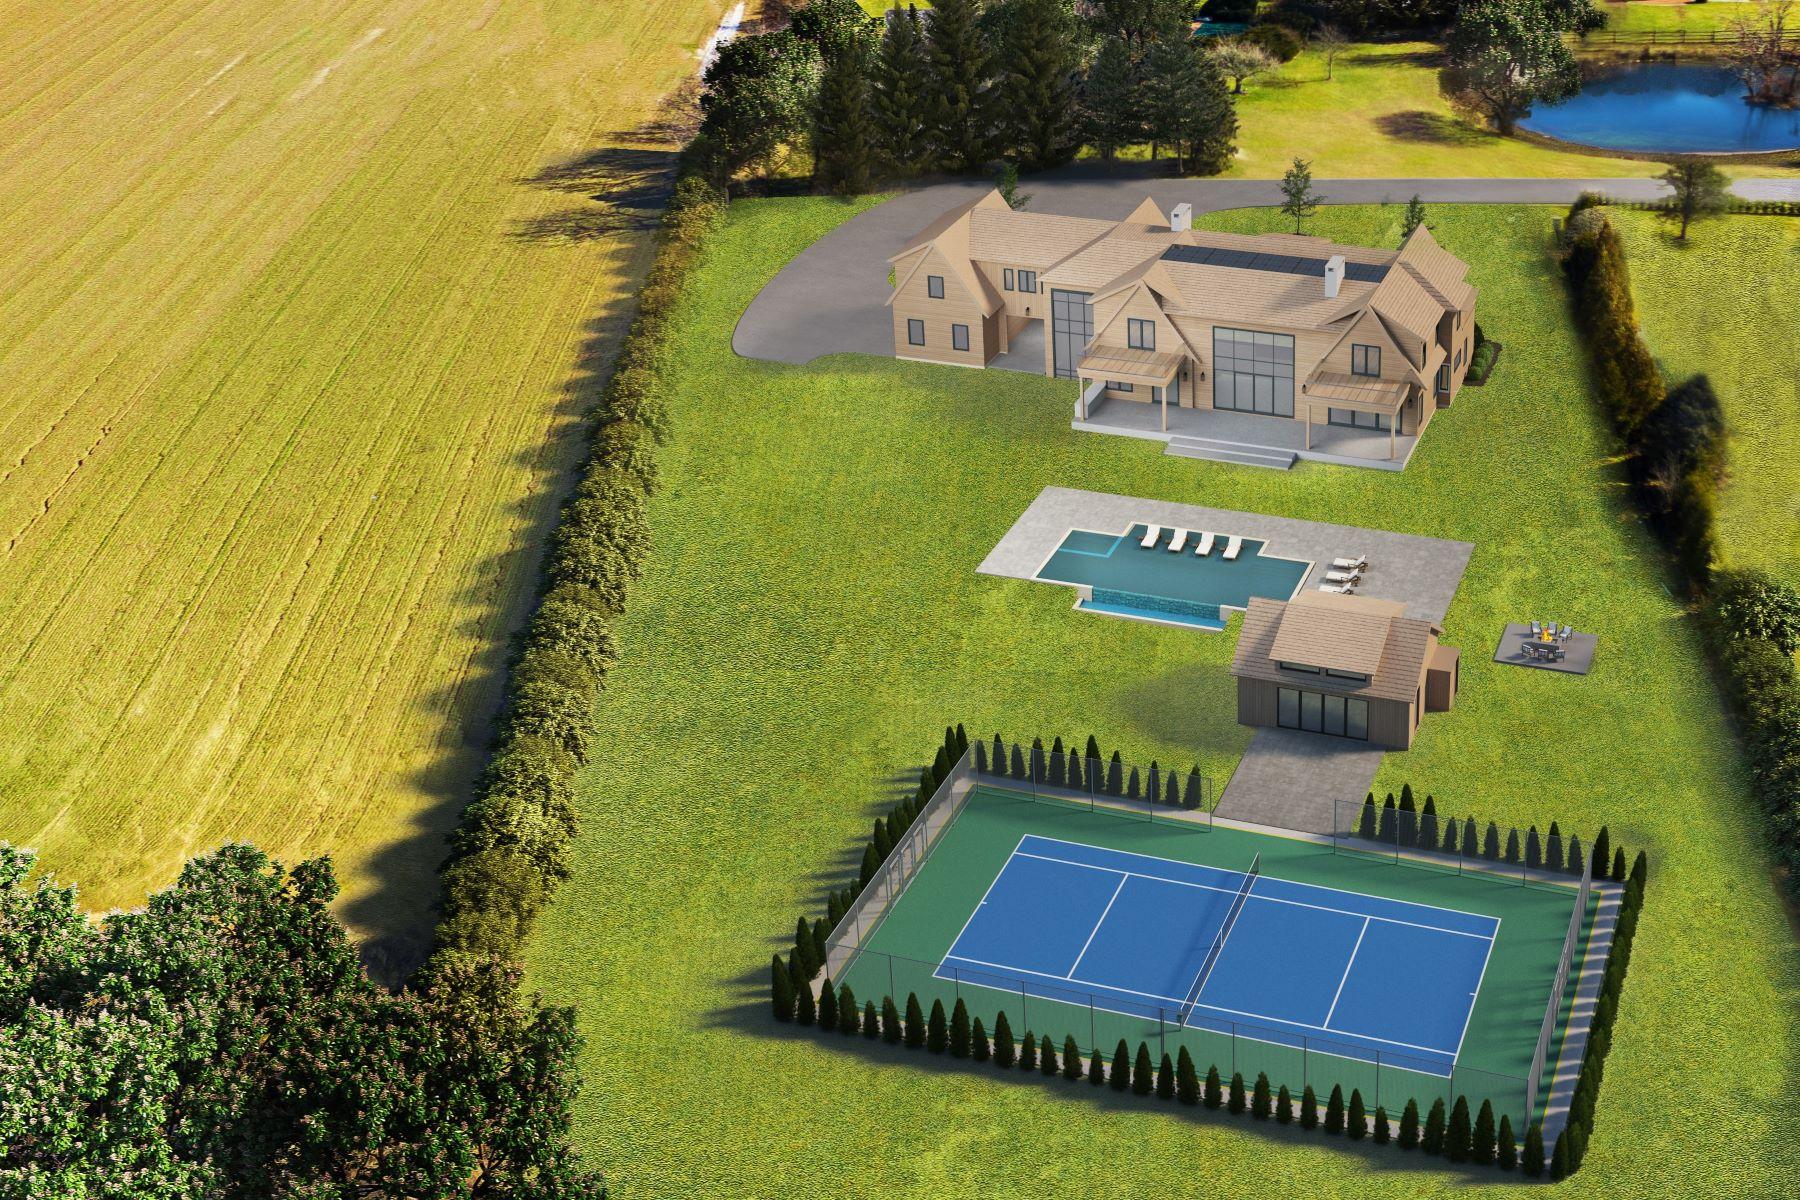 Single Family Homes for Sale at Modern New Construction,Field&Pond Views 65 Ellen Court Bridgehampton, New York 11932 United States